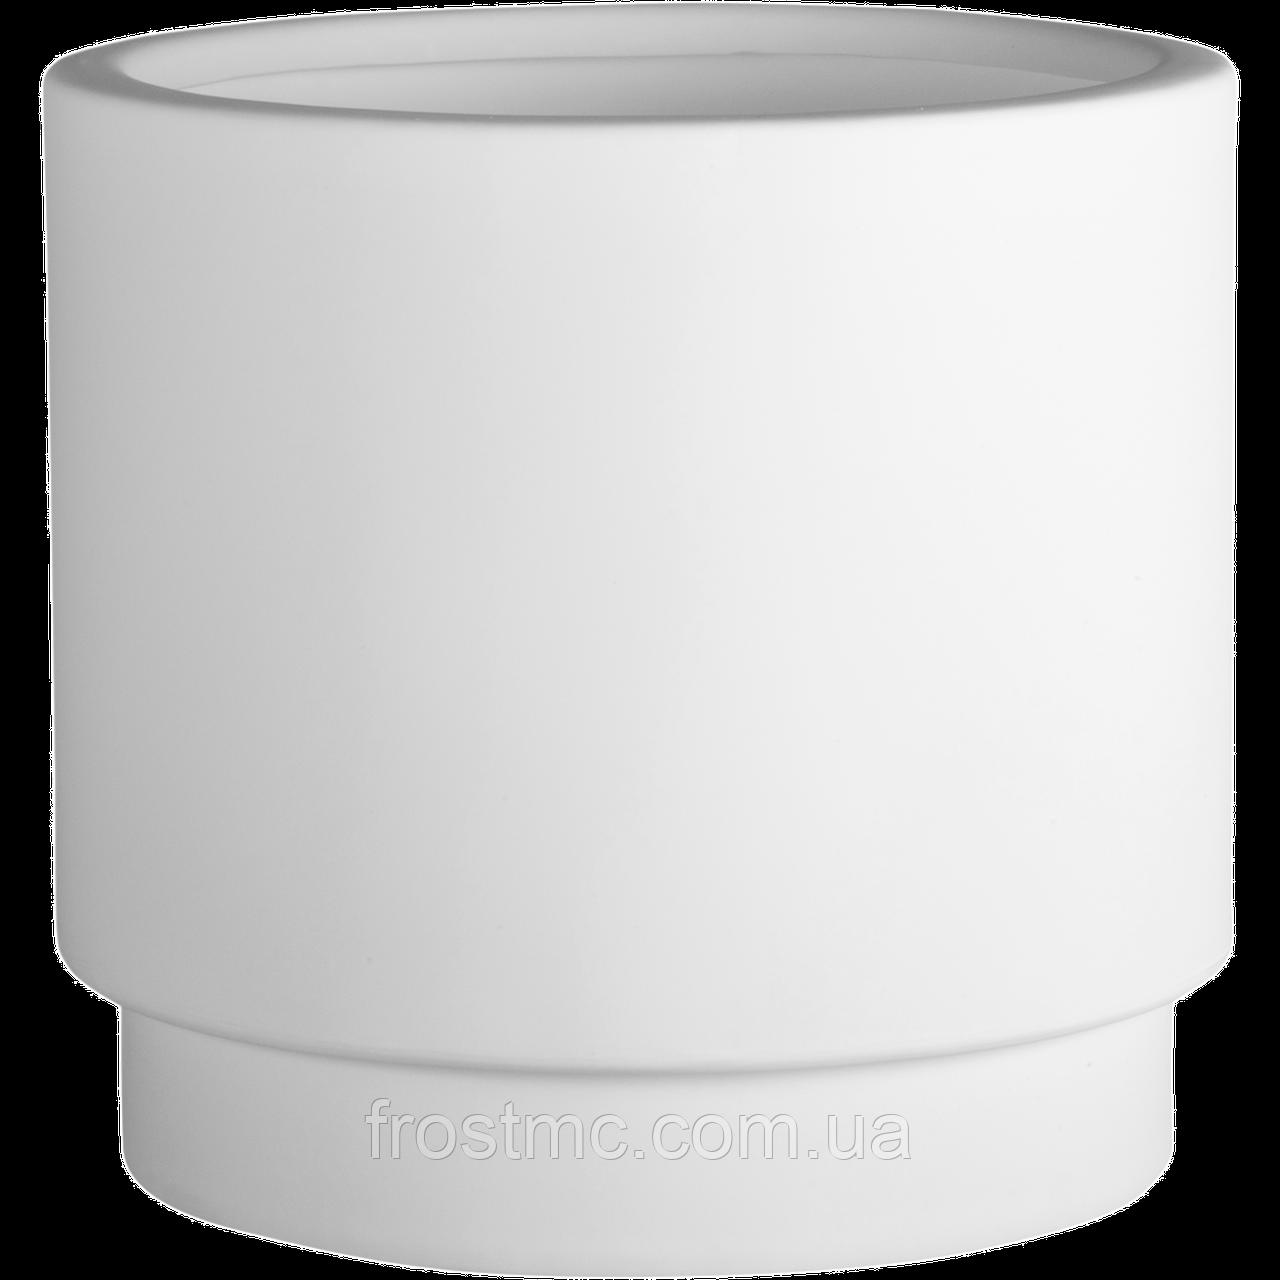 Donica White Basic ø50x40